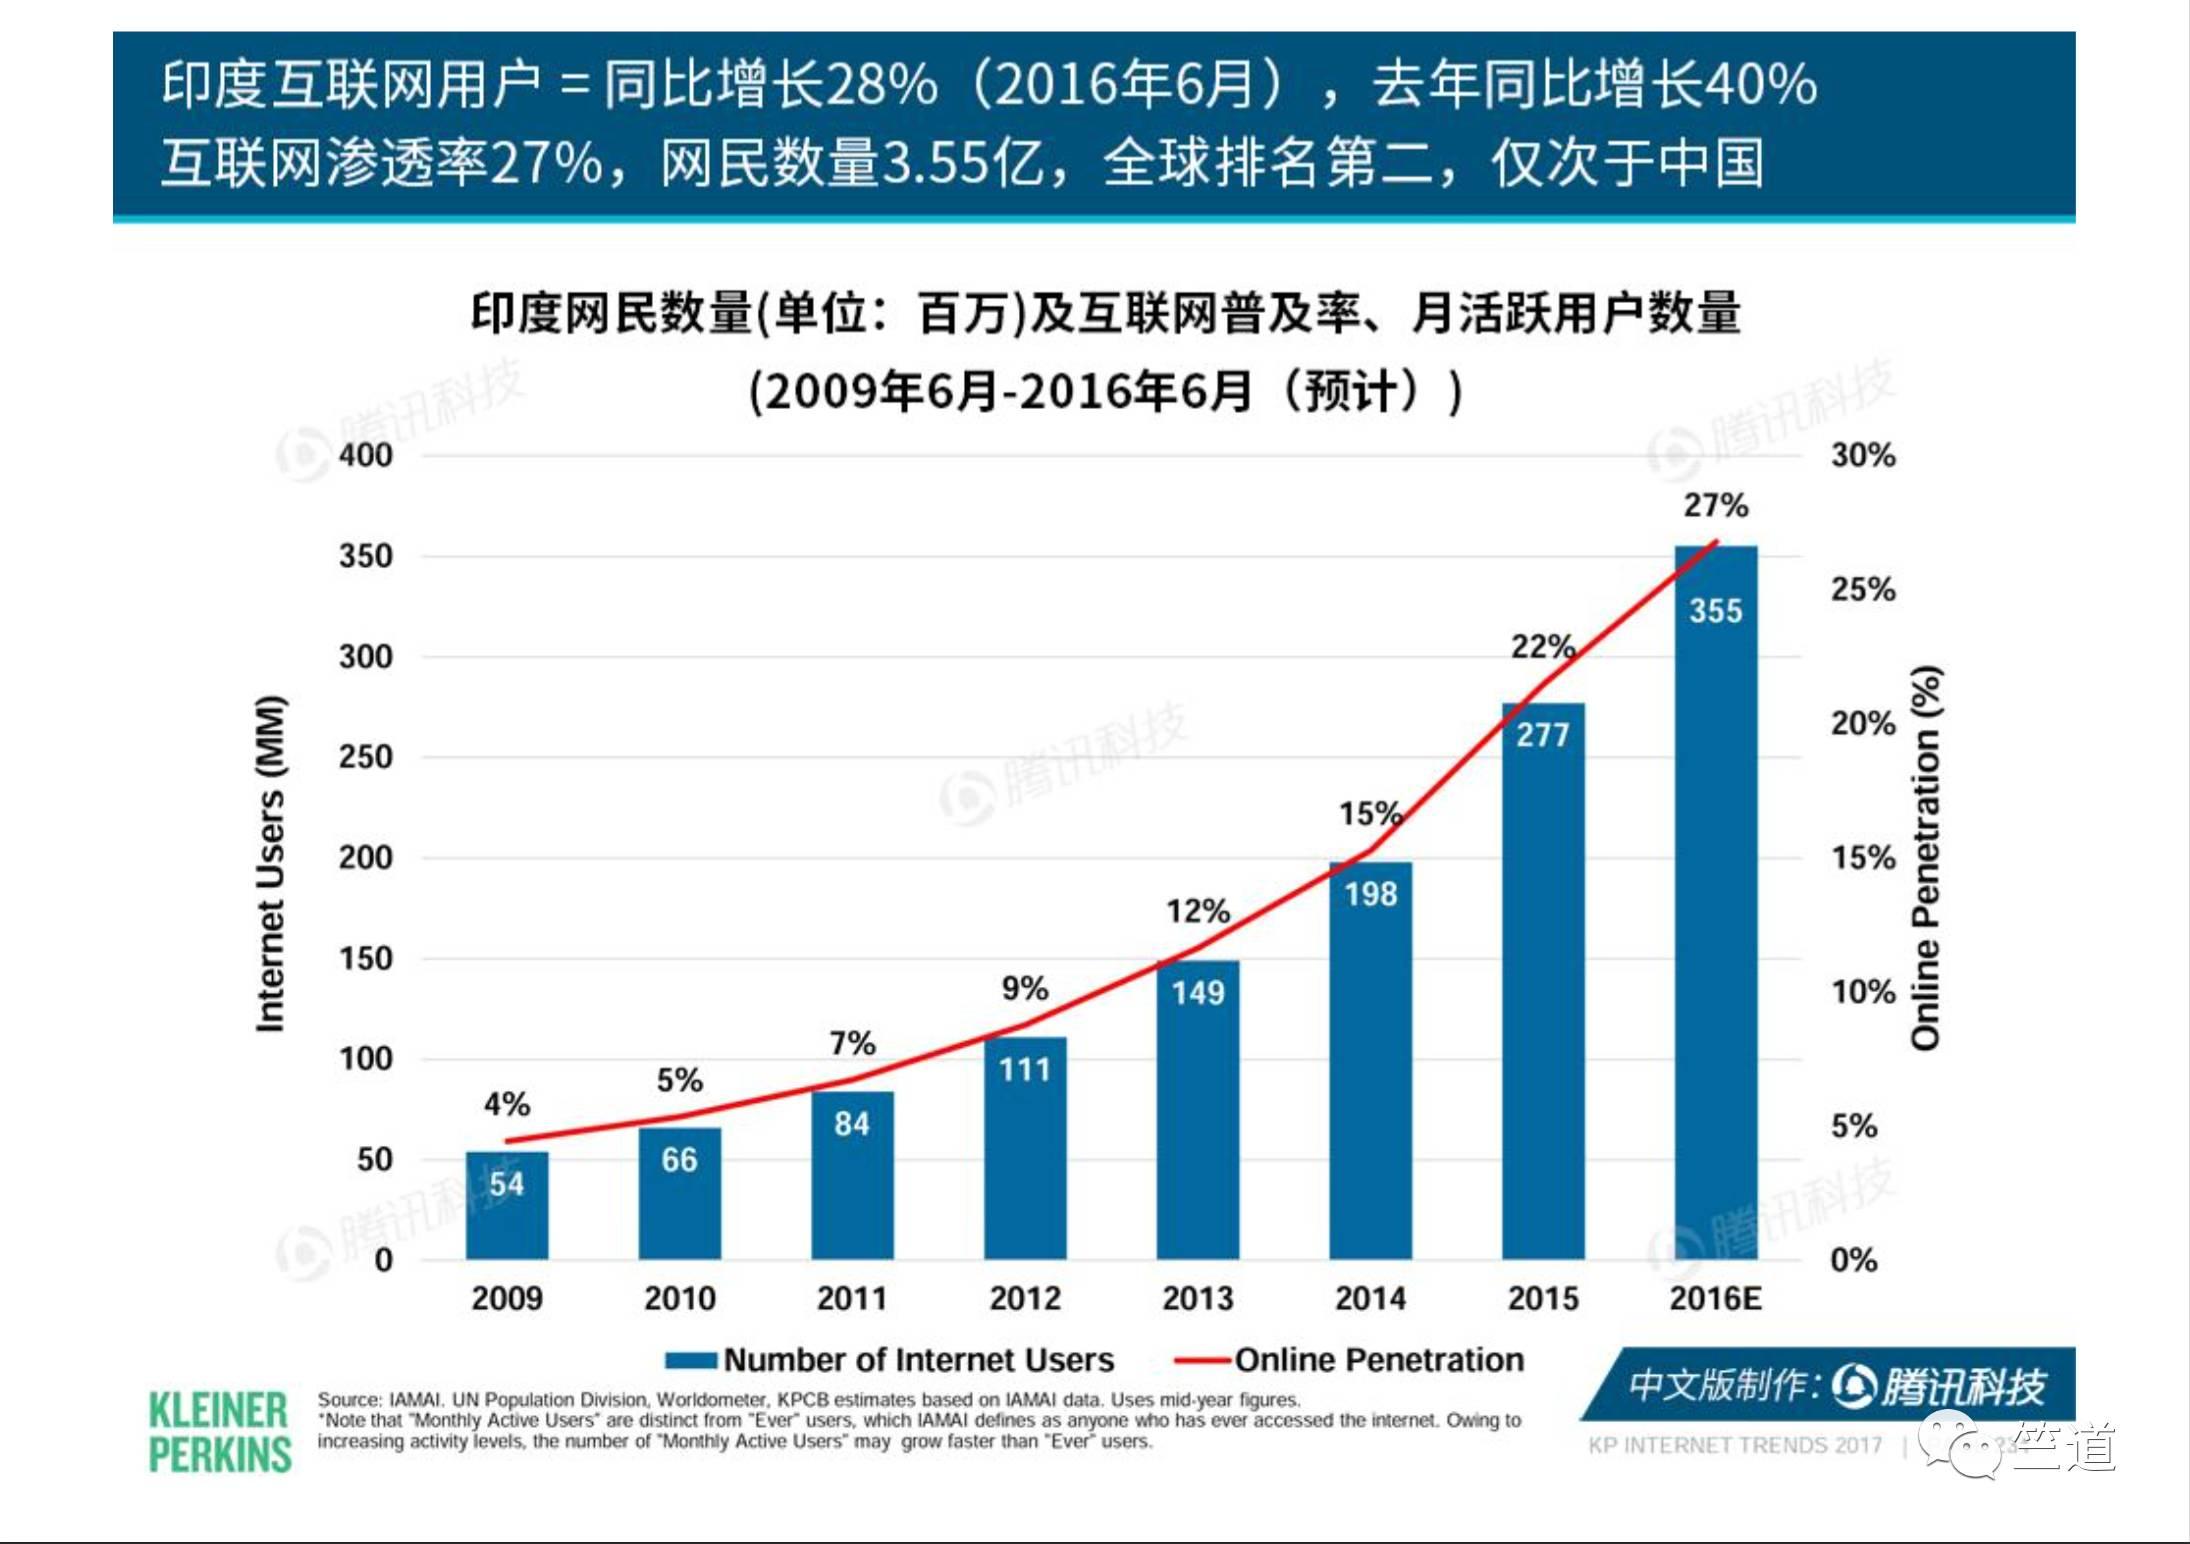 gdp中国 印度_2016年美国gdp是18.59万亿美元,中国gdp是11.19万亿美元,而印度是2.26万亿美元,美国gdp是印度的8倍多,中国gdp是印